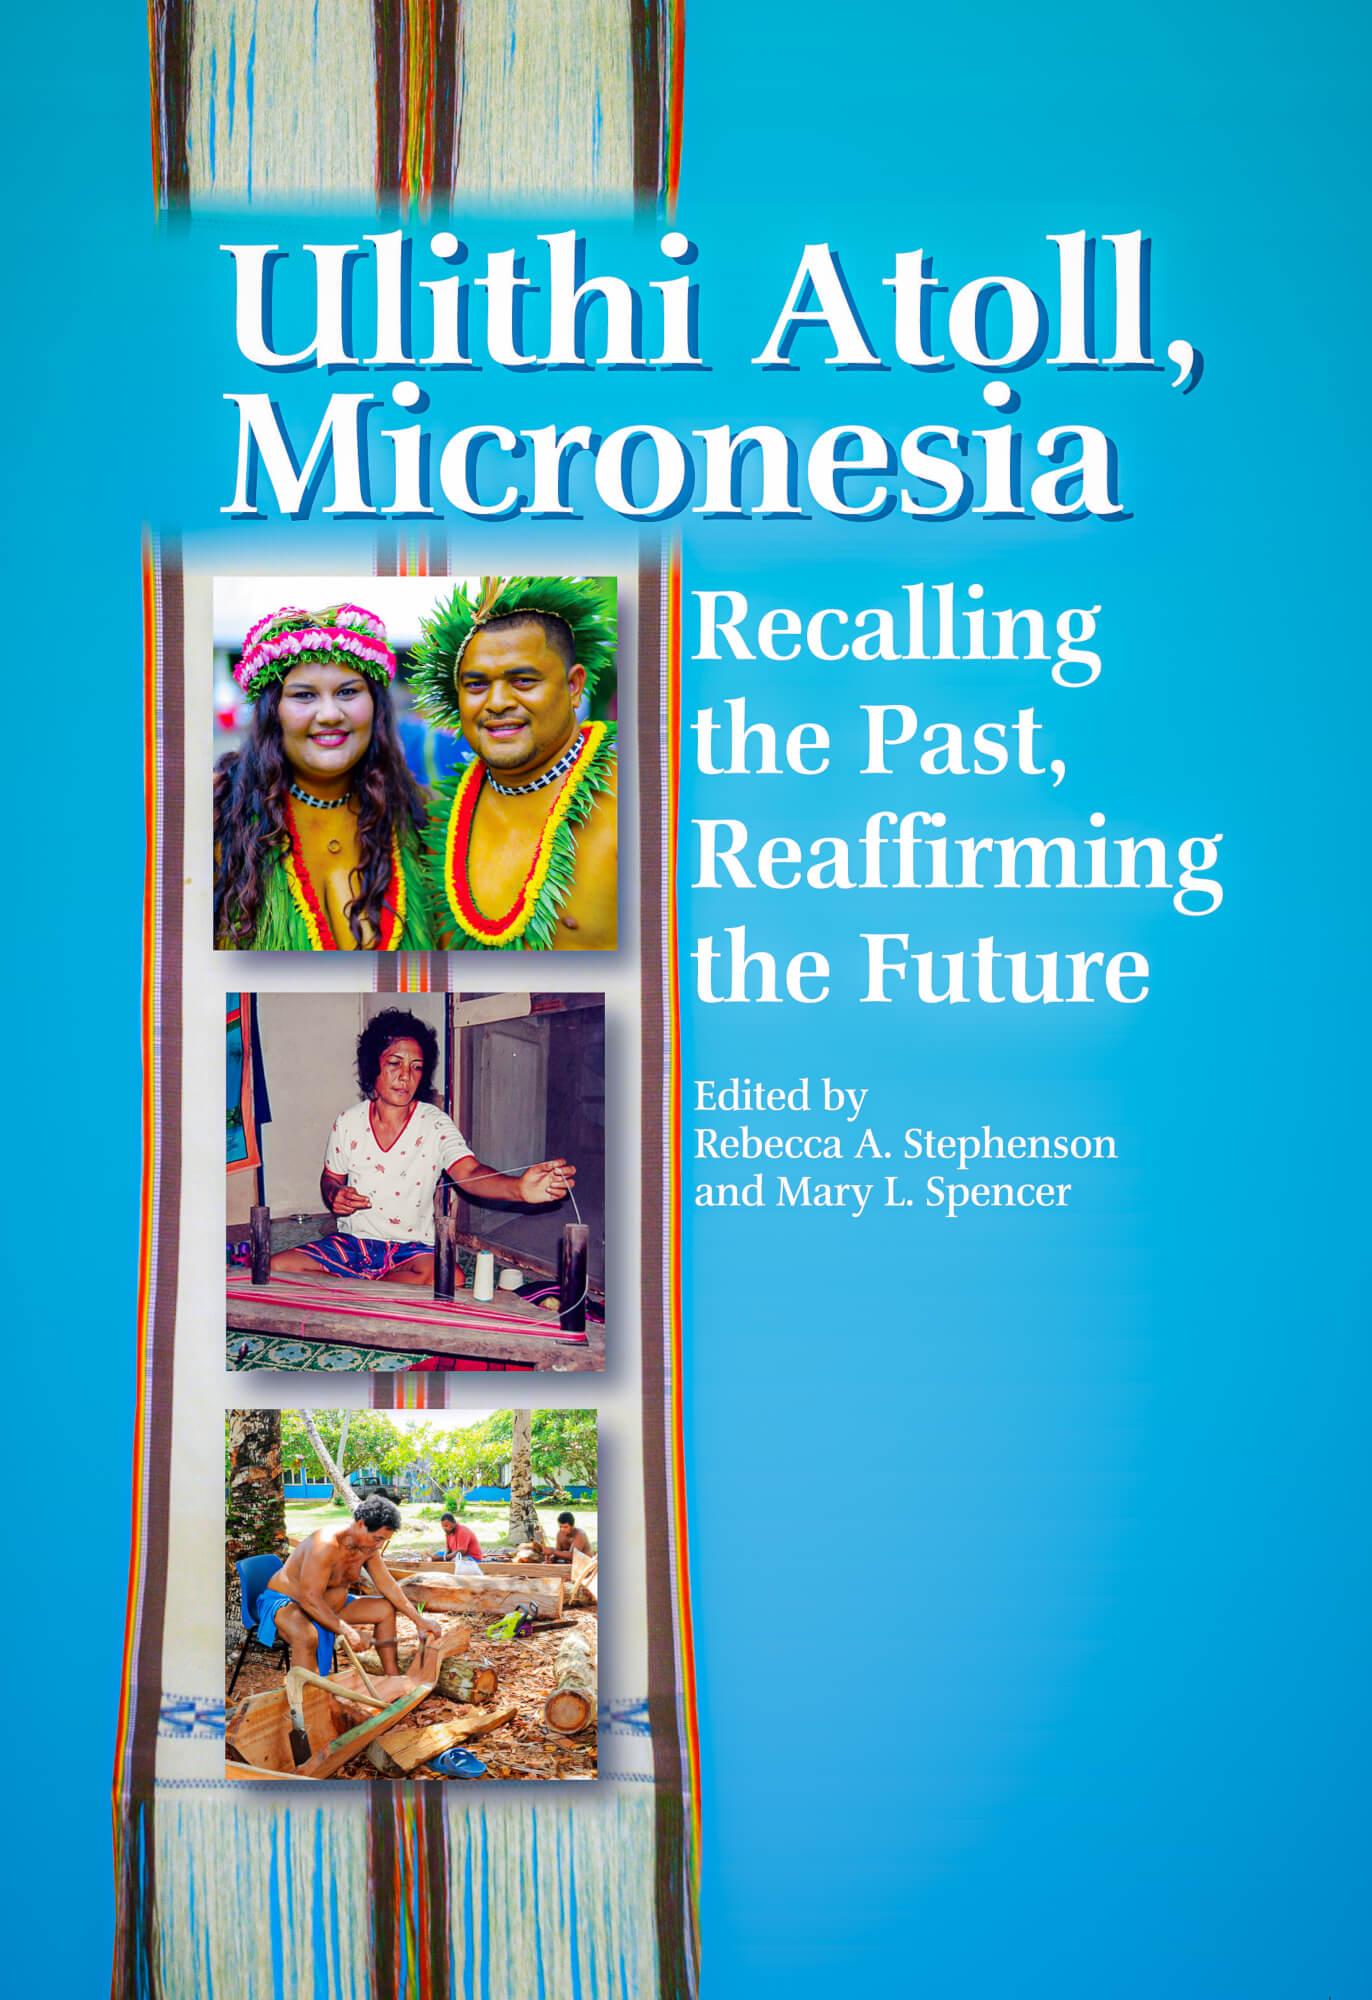 UOG Press Book Launch: Ulithi Atoll, Micronesia